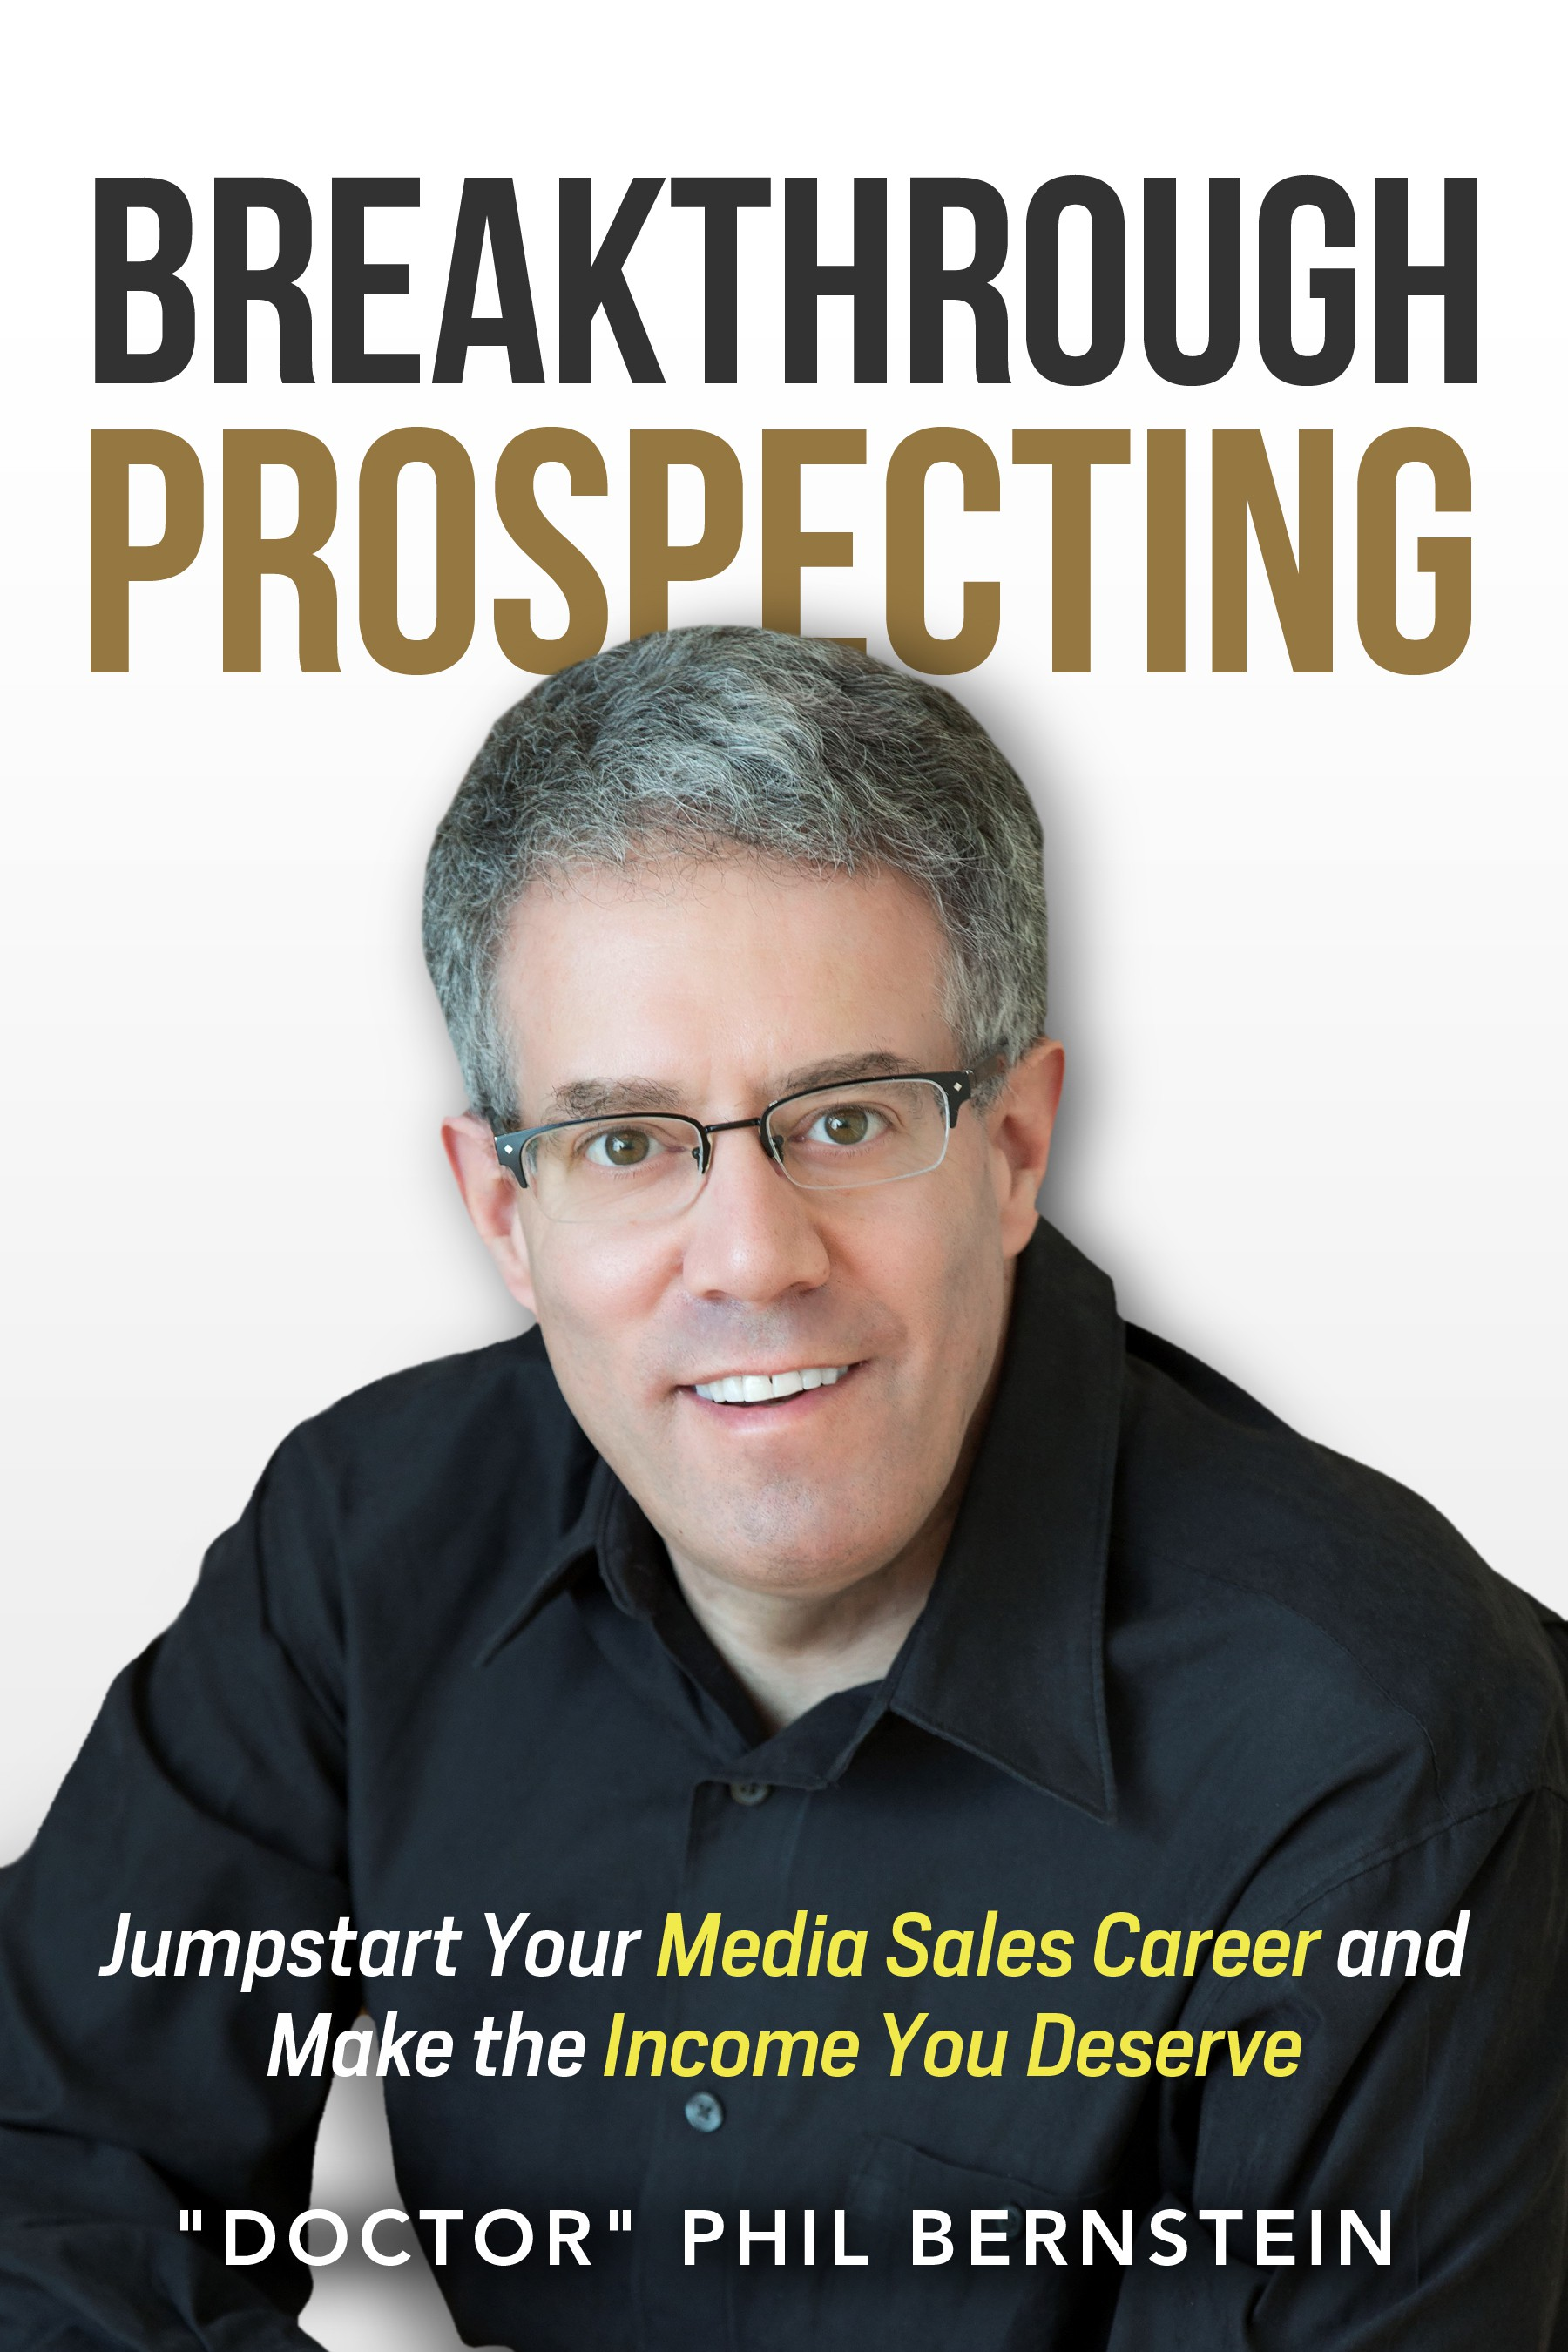 Brilliant Sales Book Needs a Cover